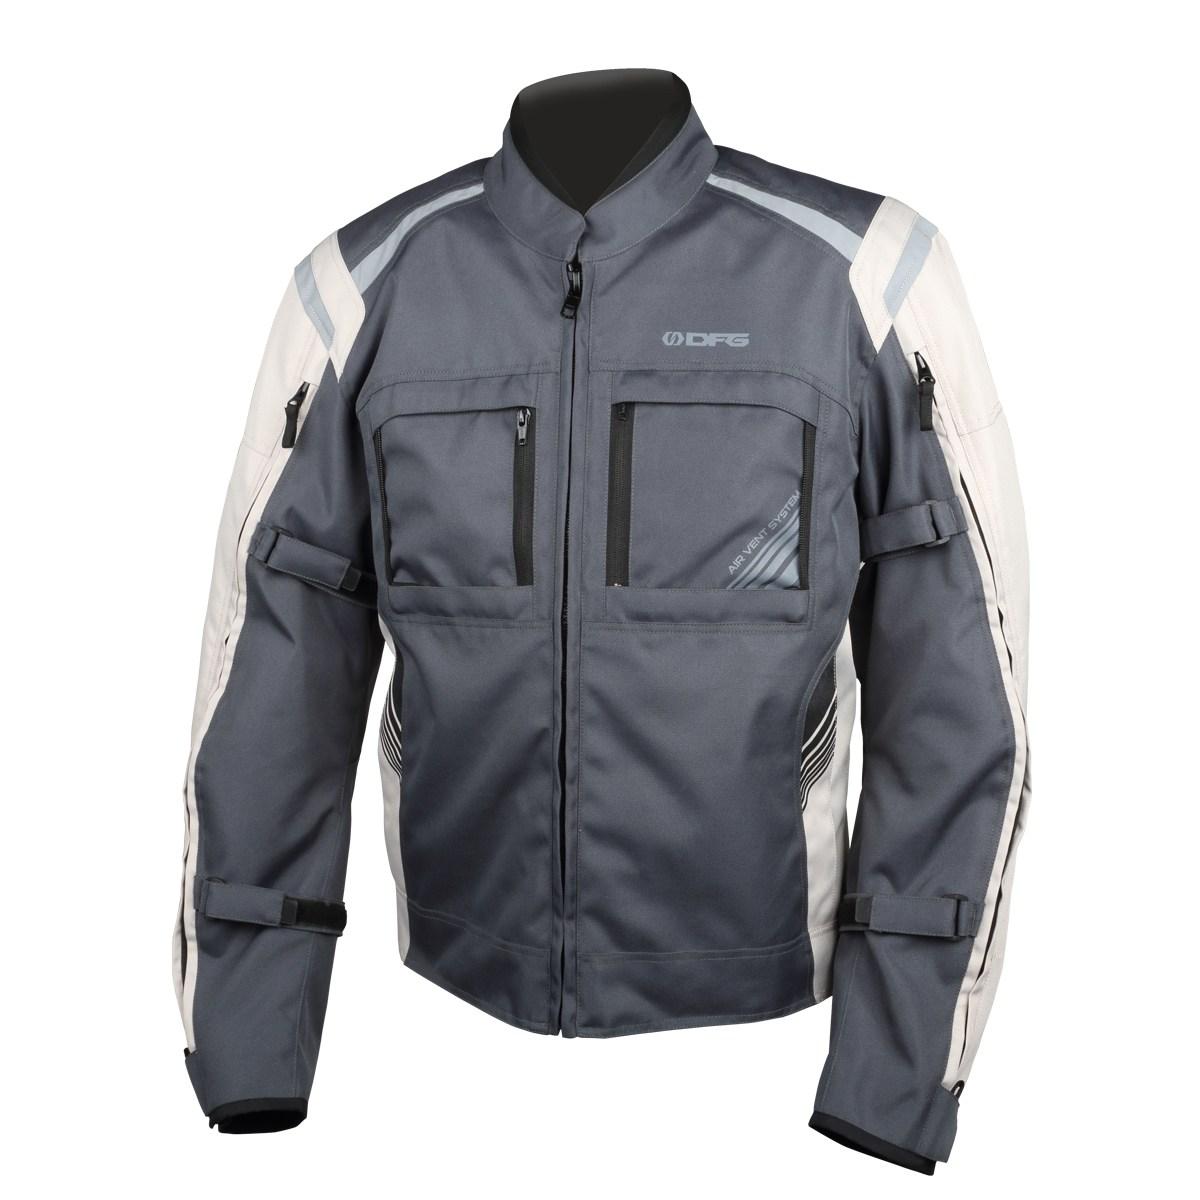 DFG DG2304-0035 ナビゲータークールジャケット スチール/シルバー XXLサイズ ダートフリーク